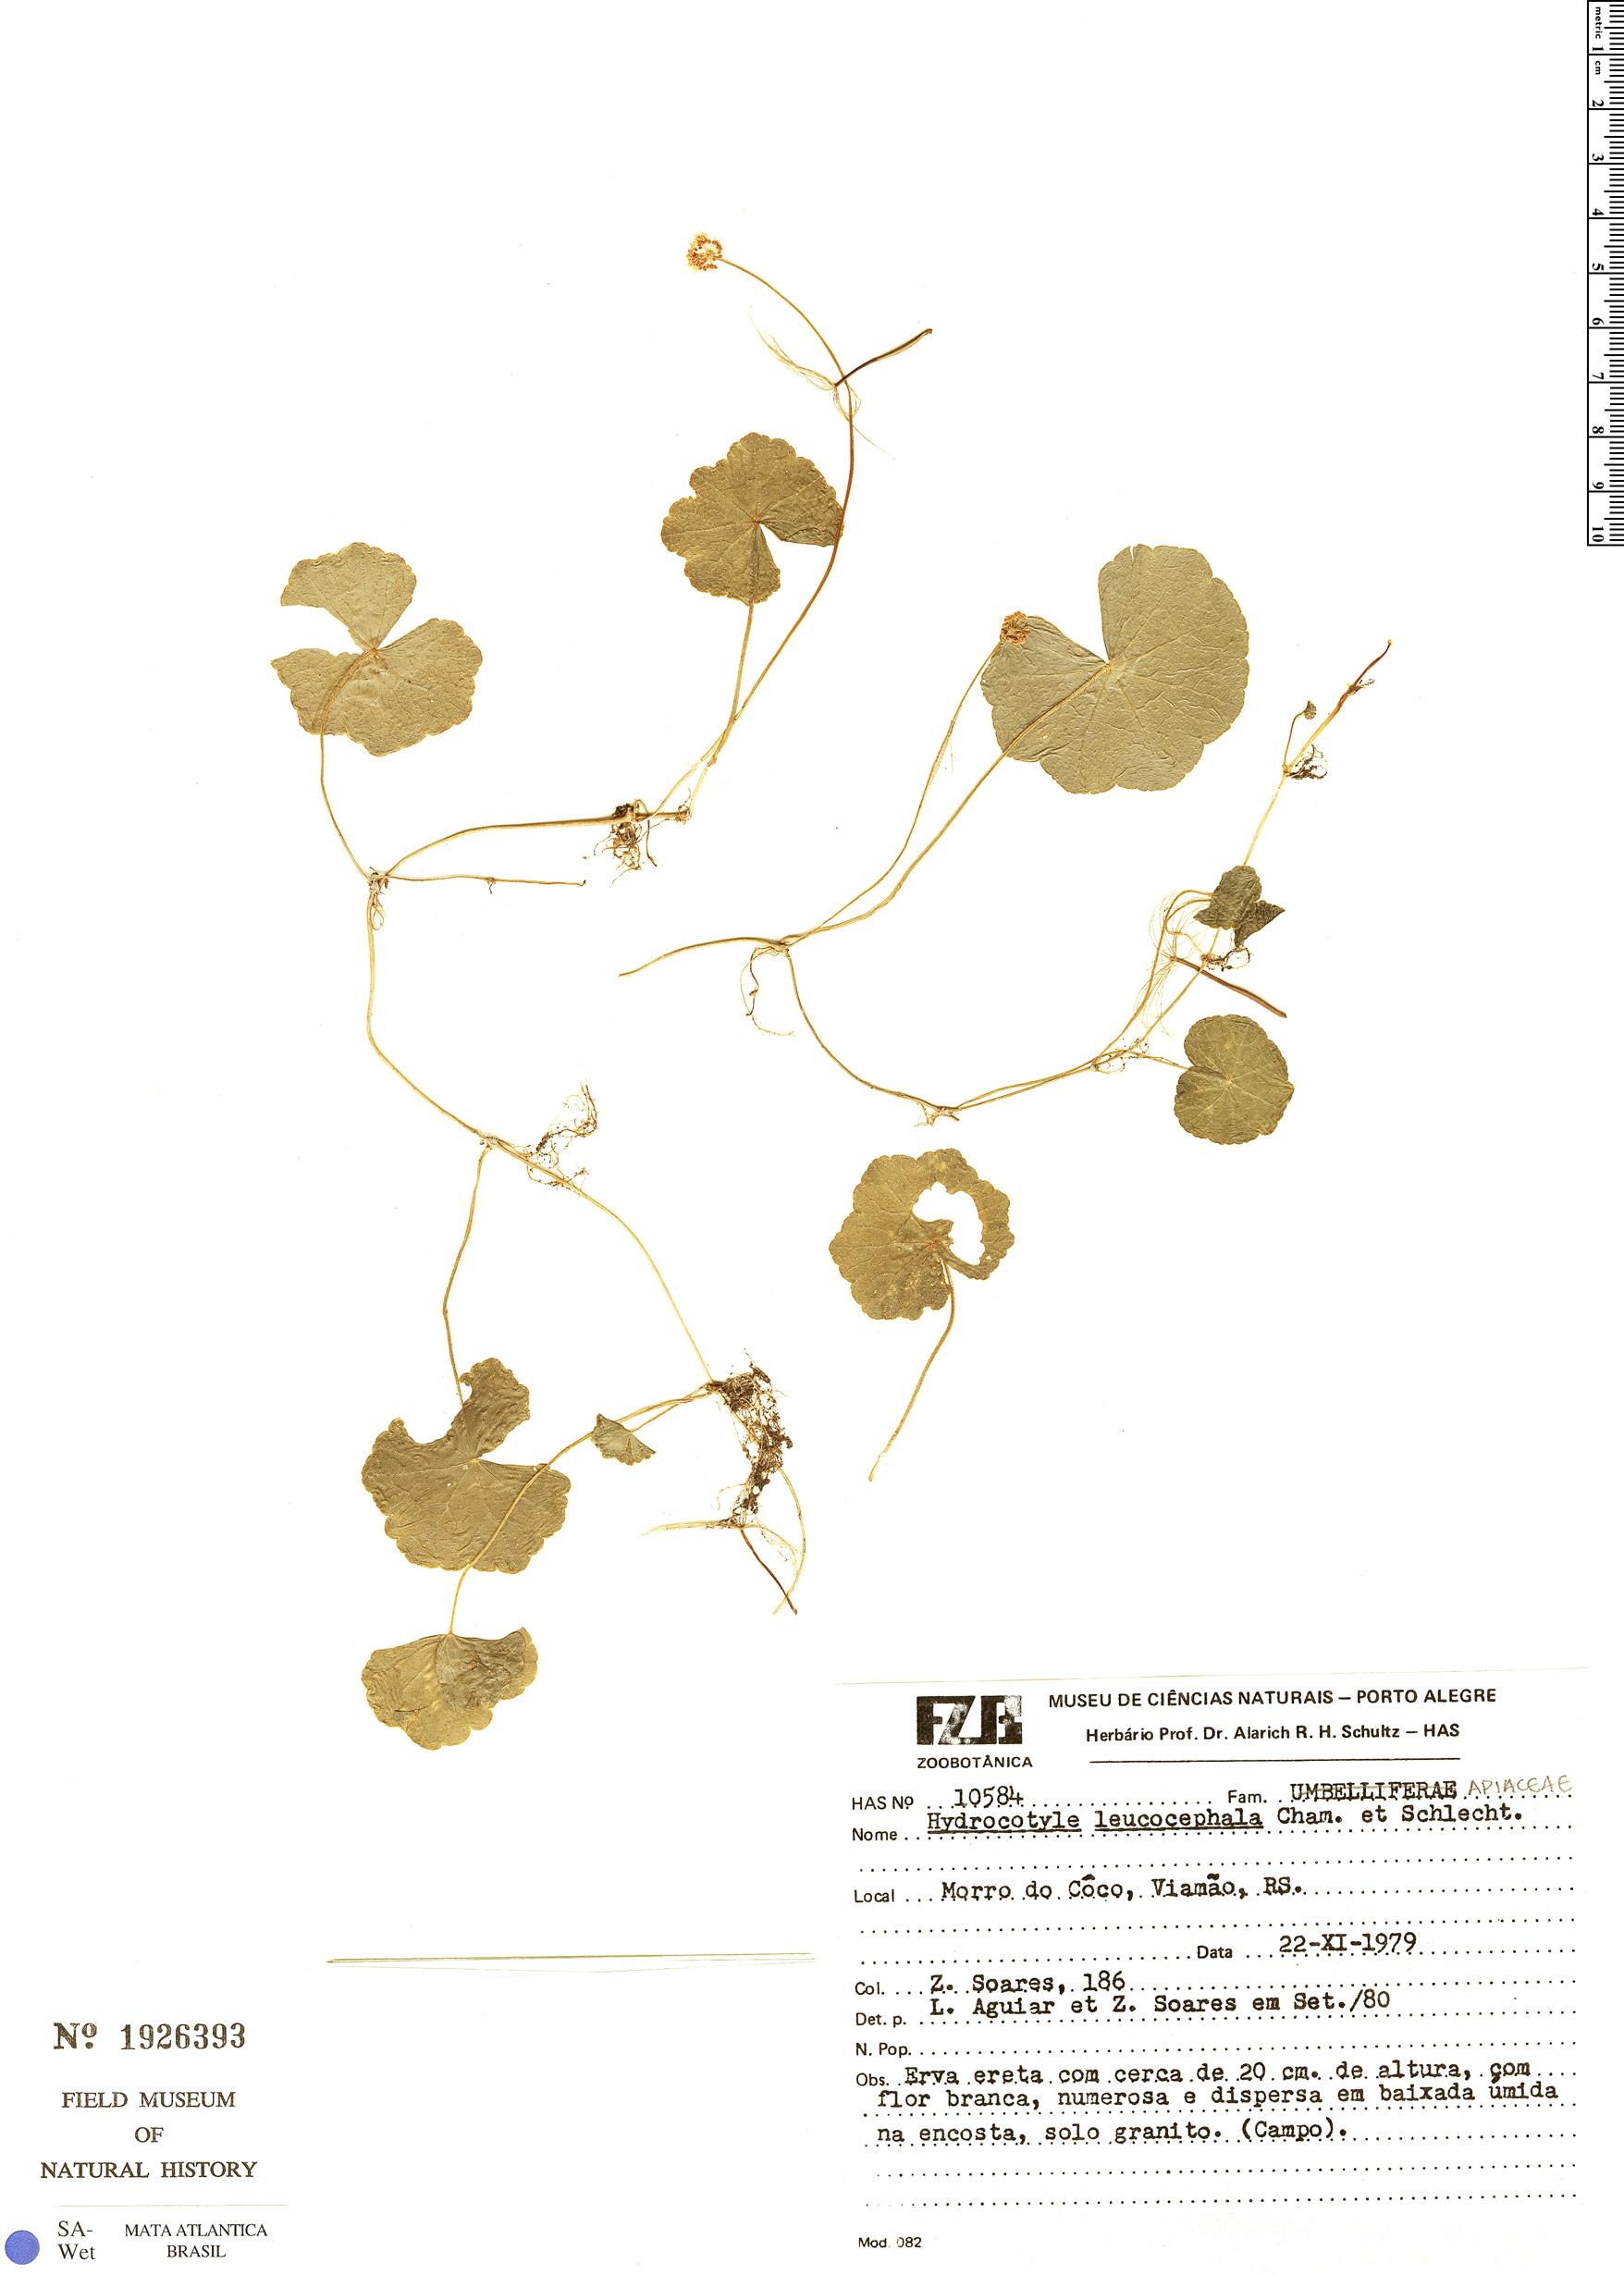 Specimen: Hydrocotyle leucocephala